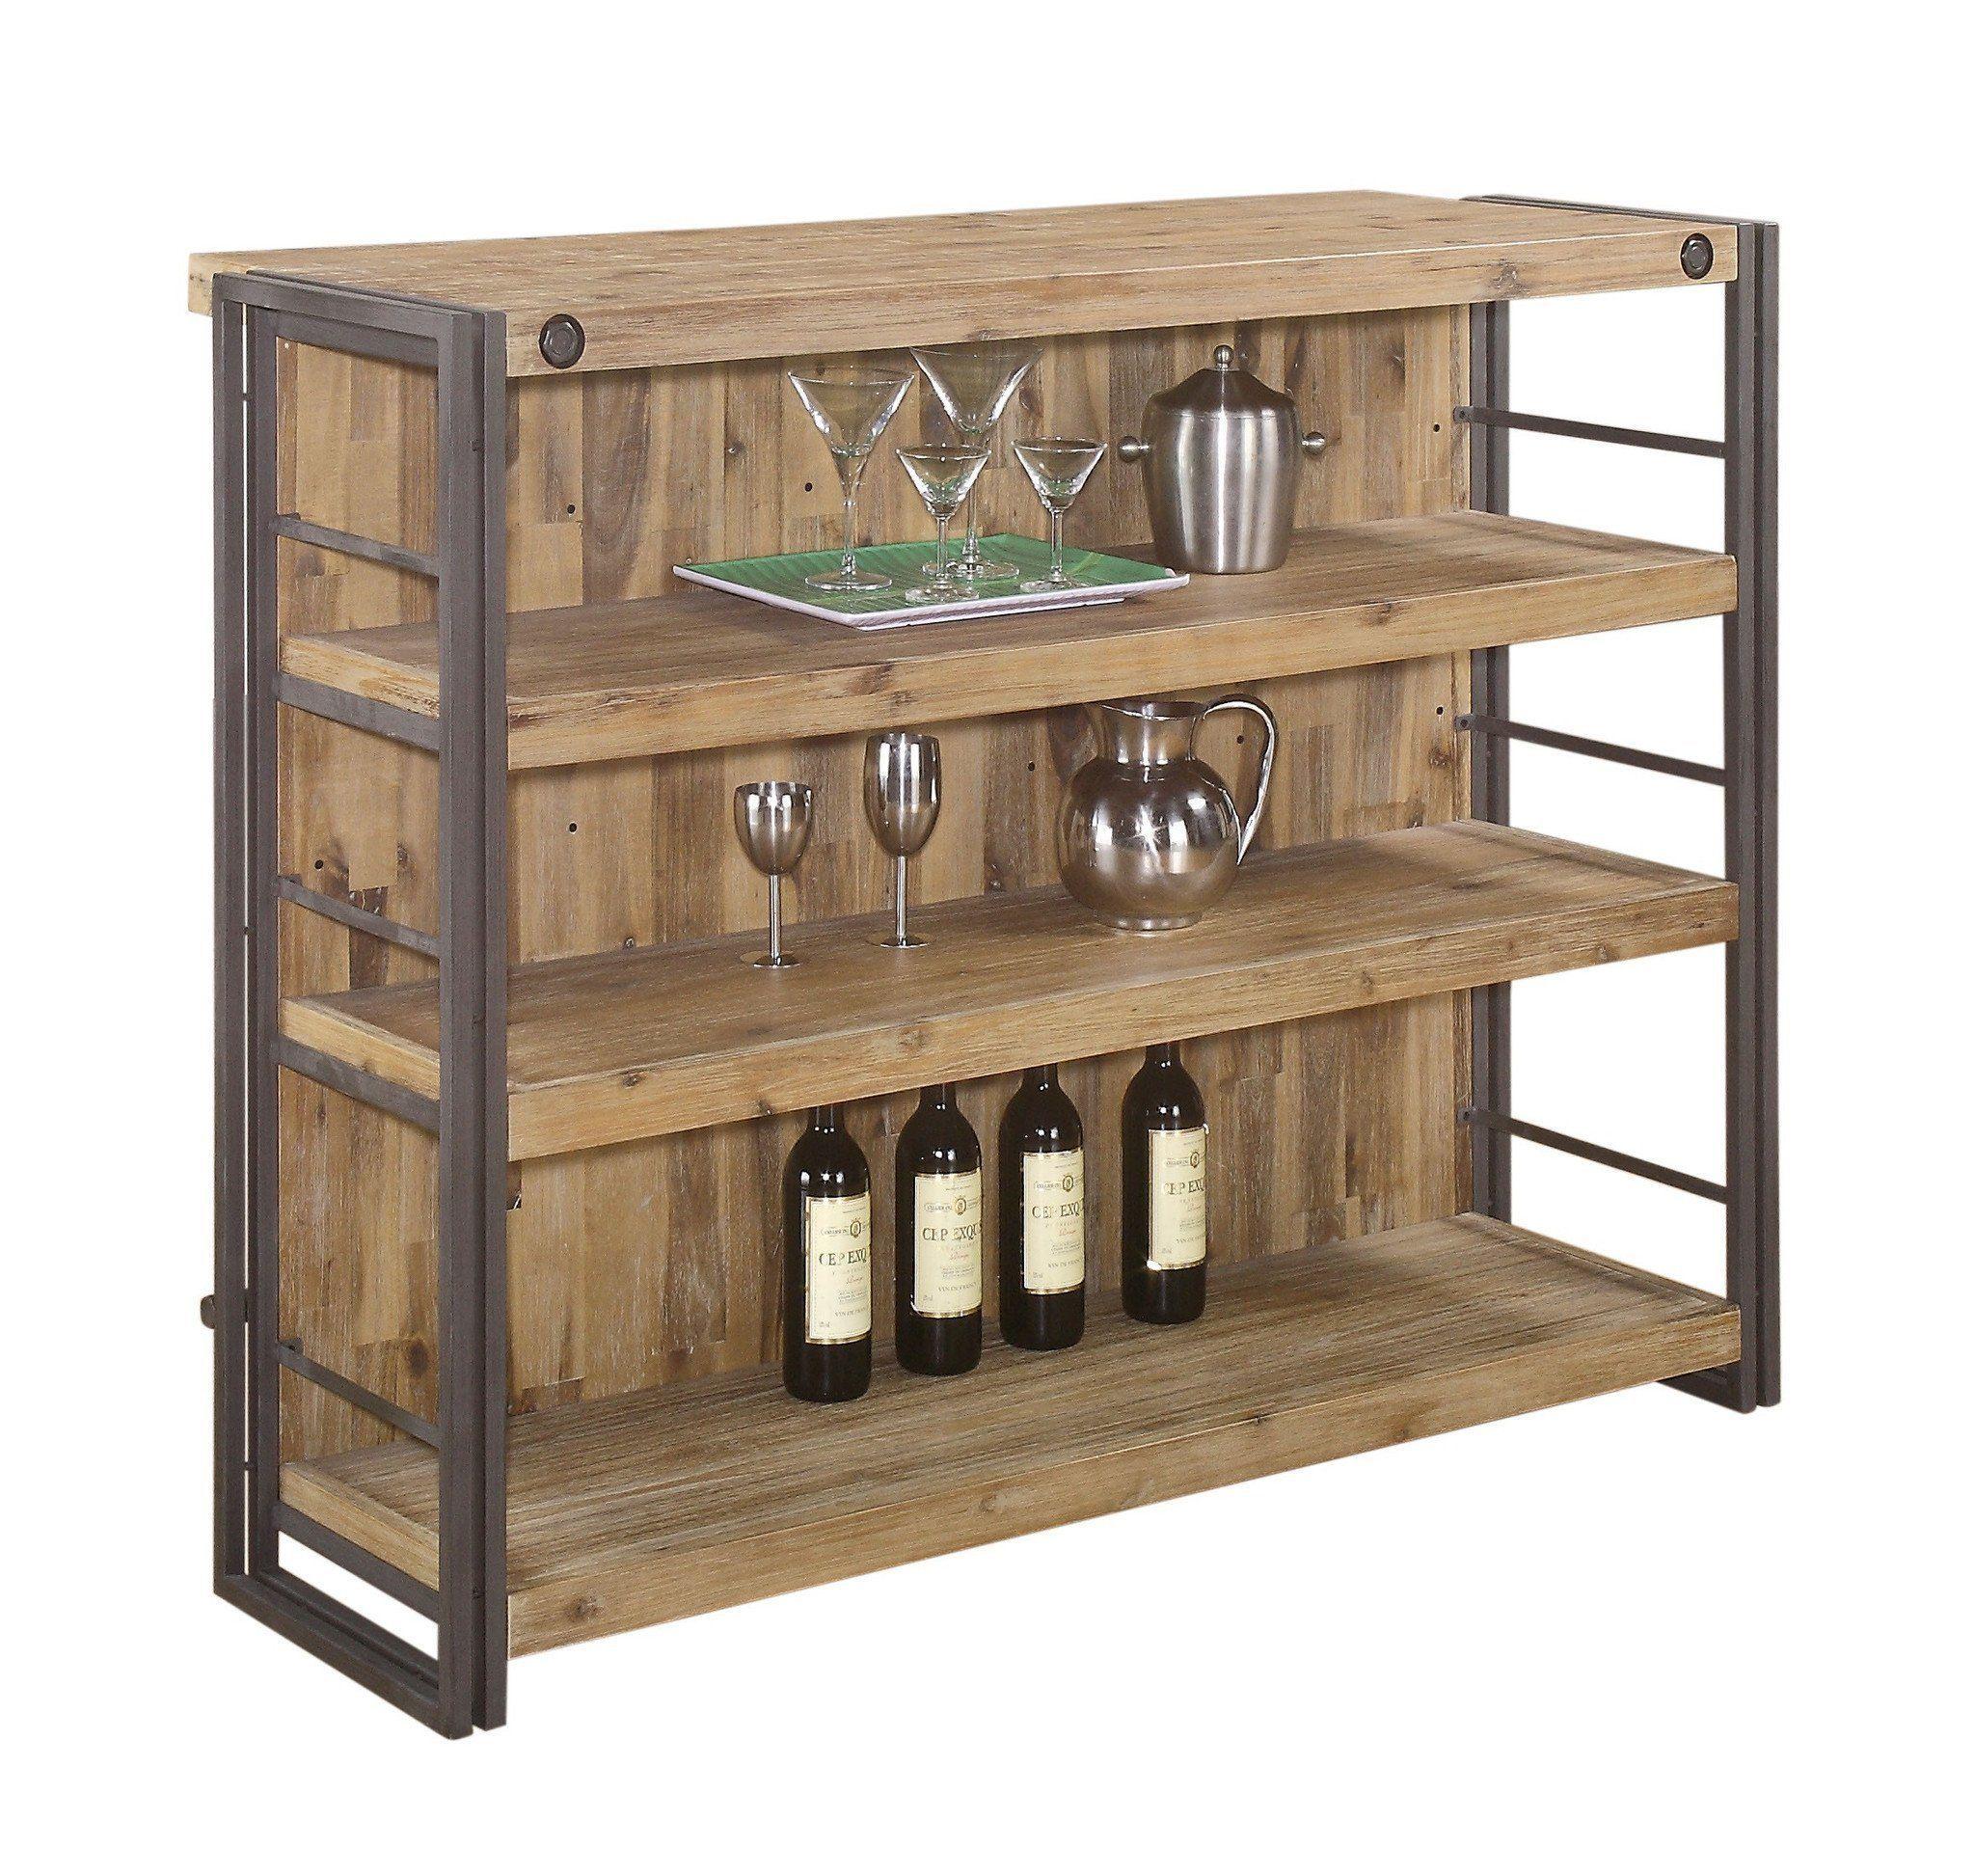 Moeus home brooklyn bar acacia wood industrial chic and acacia